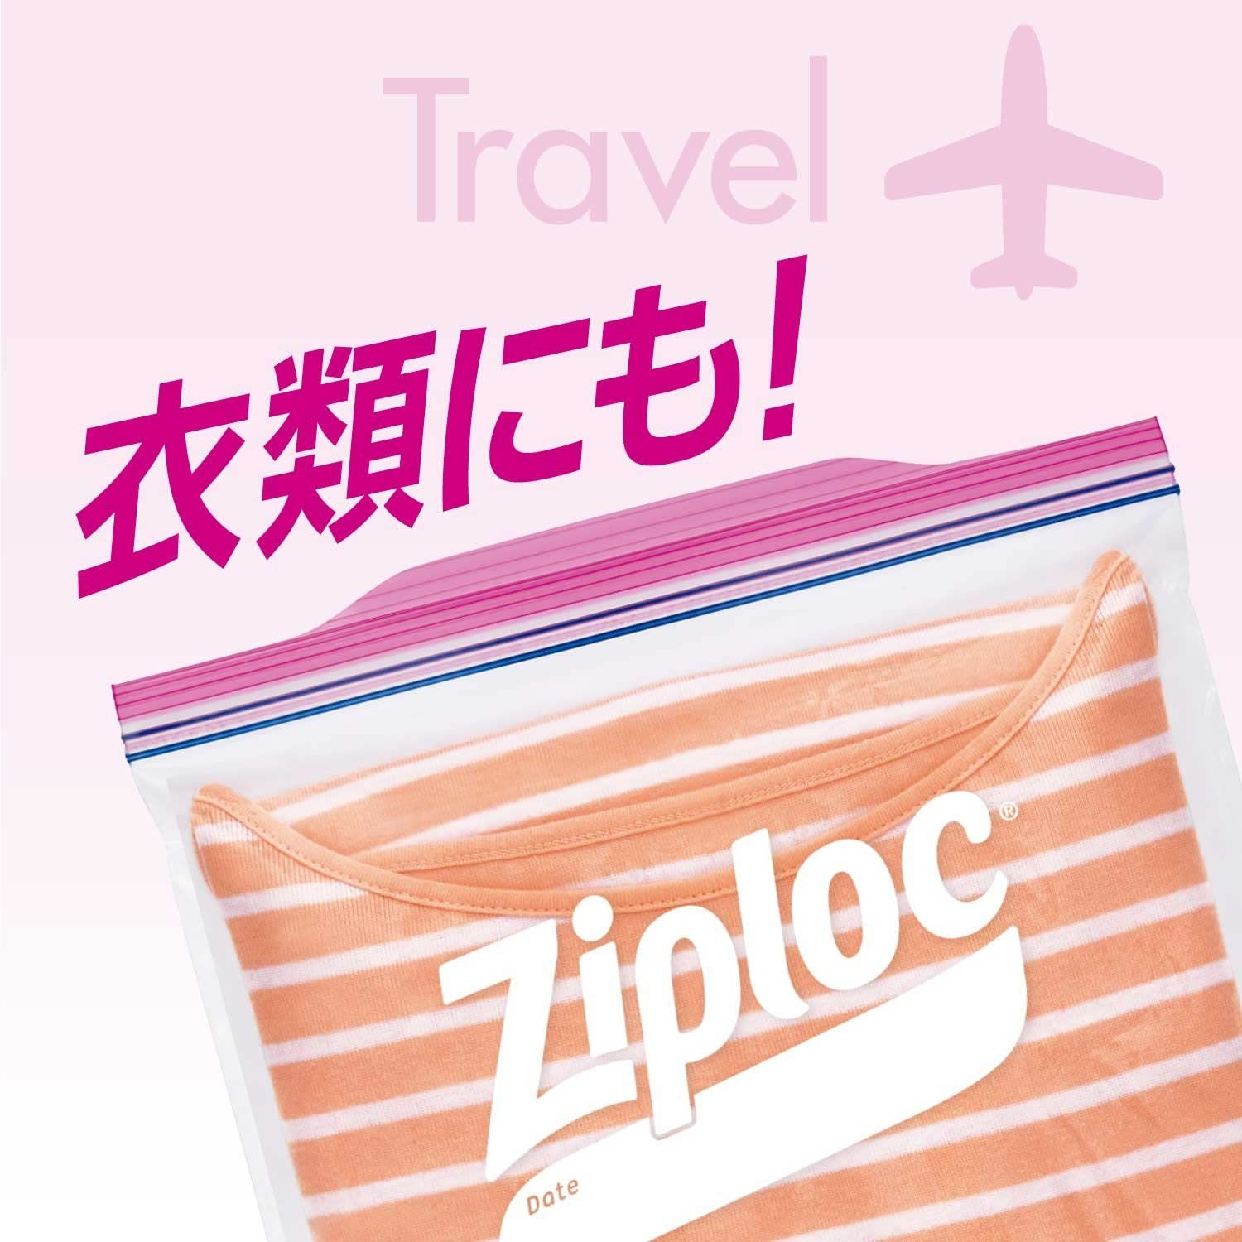 Ziploc(ジップロック) ストックバッグ Mサイズの商品画像6